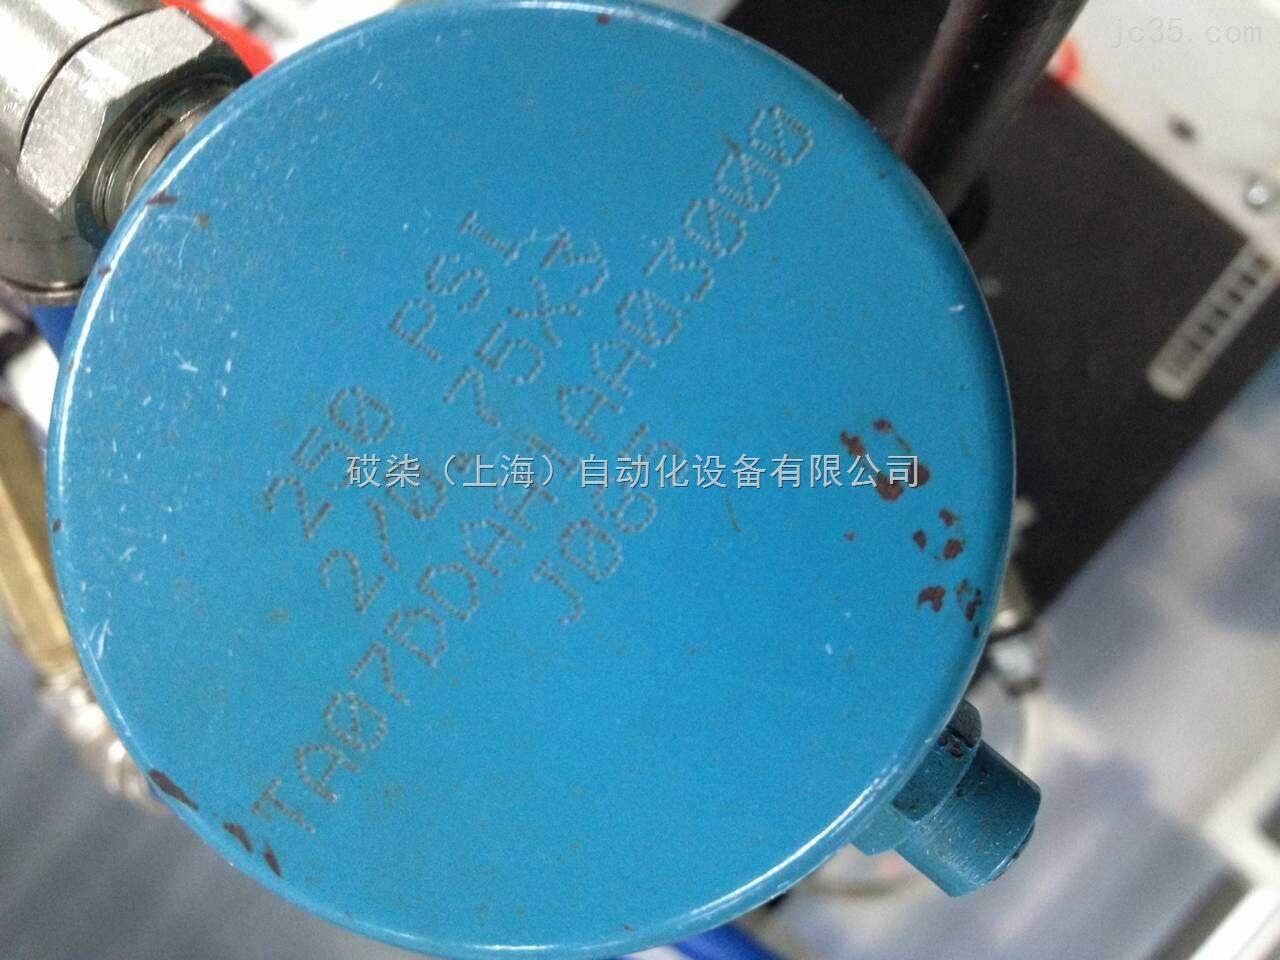 YDSTECHETS 170-TOXTOXEPS-004 TOX 347860-砹柒(上海)自动化